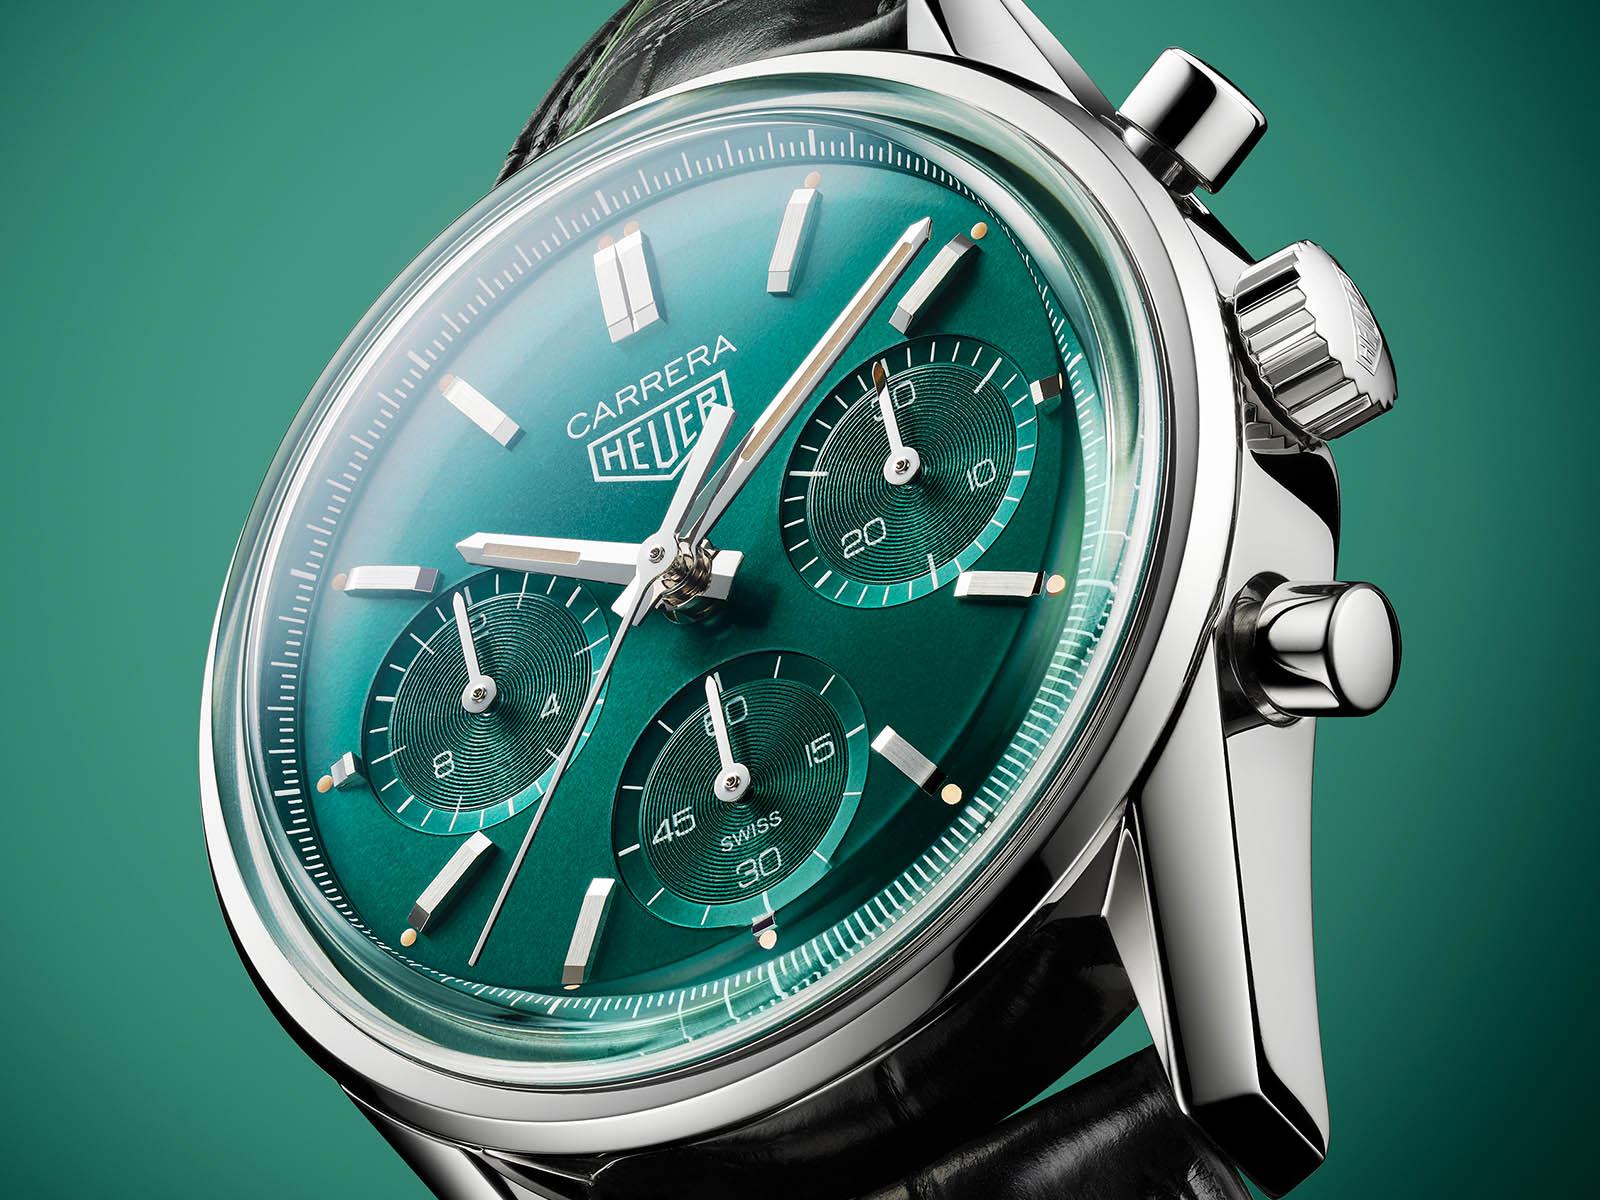 cbk221f-fc6479-tag-heuer-carrera-green-special-edition-3.jpg